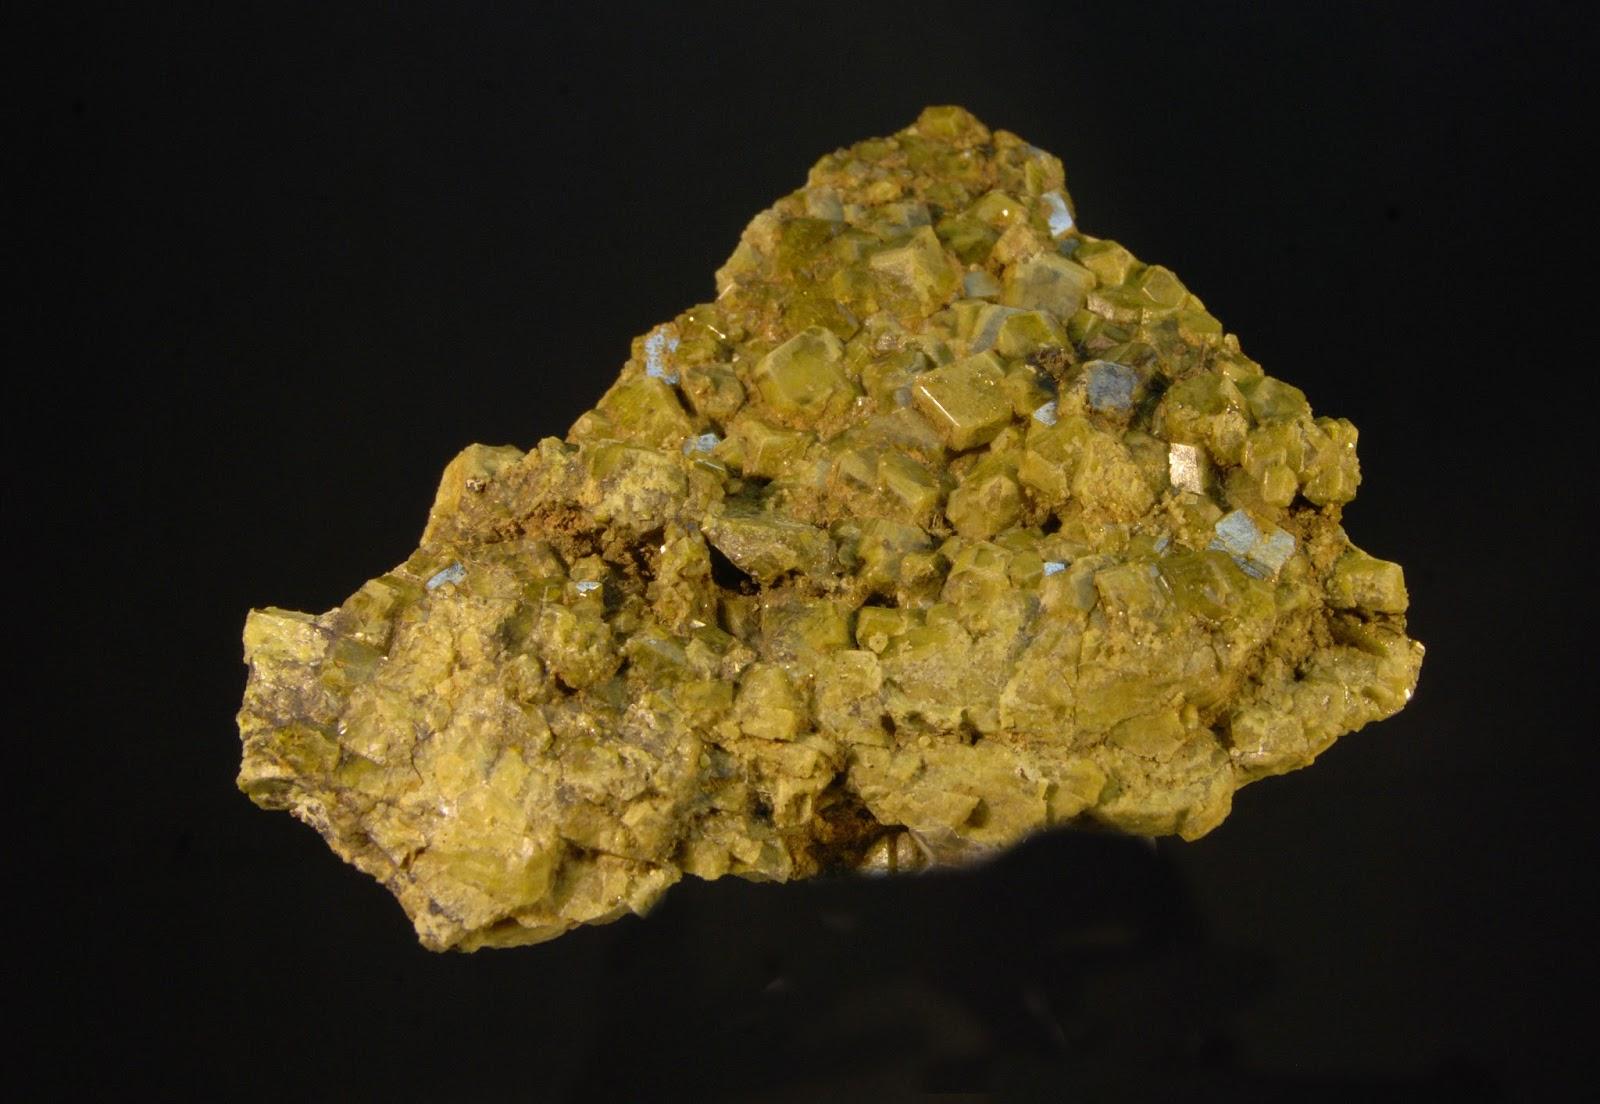 Clasificacion de Granates,fotos y yacimientos. Grossularia%2Bverde%2B%252CMina%2BEl%2BMico%252C%2BCuesta%2Bde%2BCarboneros%252C%2BC%25C3%25B3rdoba%252C%2BAndaluc%25C3%25ADa%252C%2BEspa%25C3%25B1a